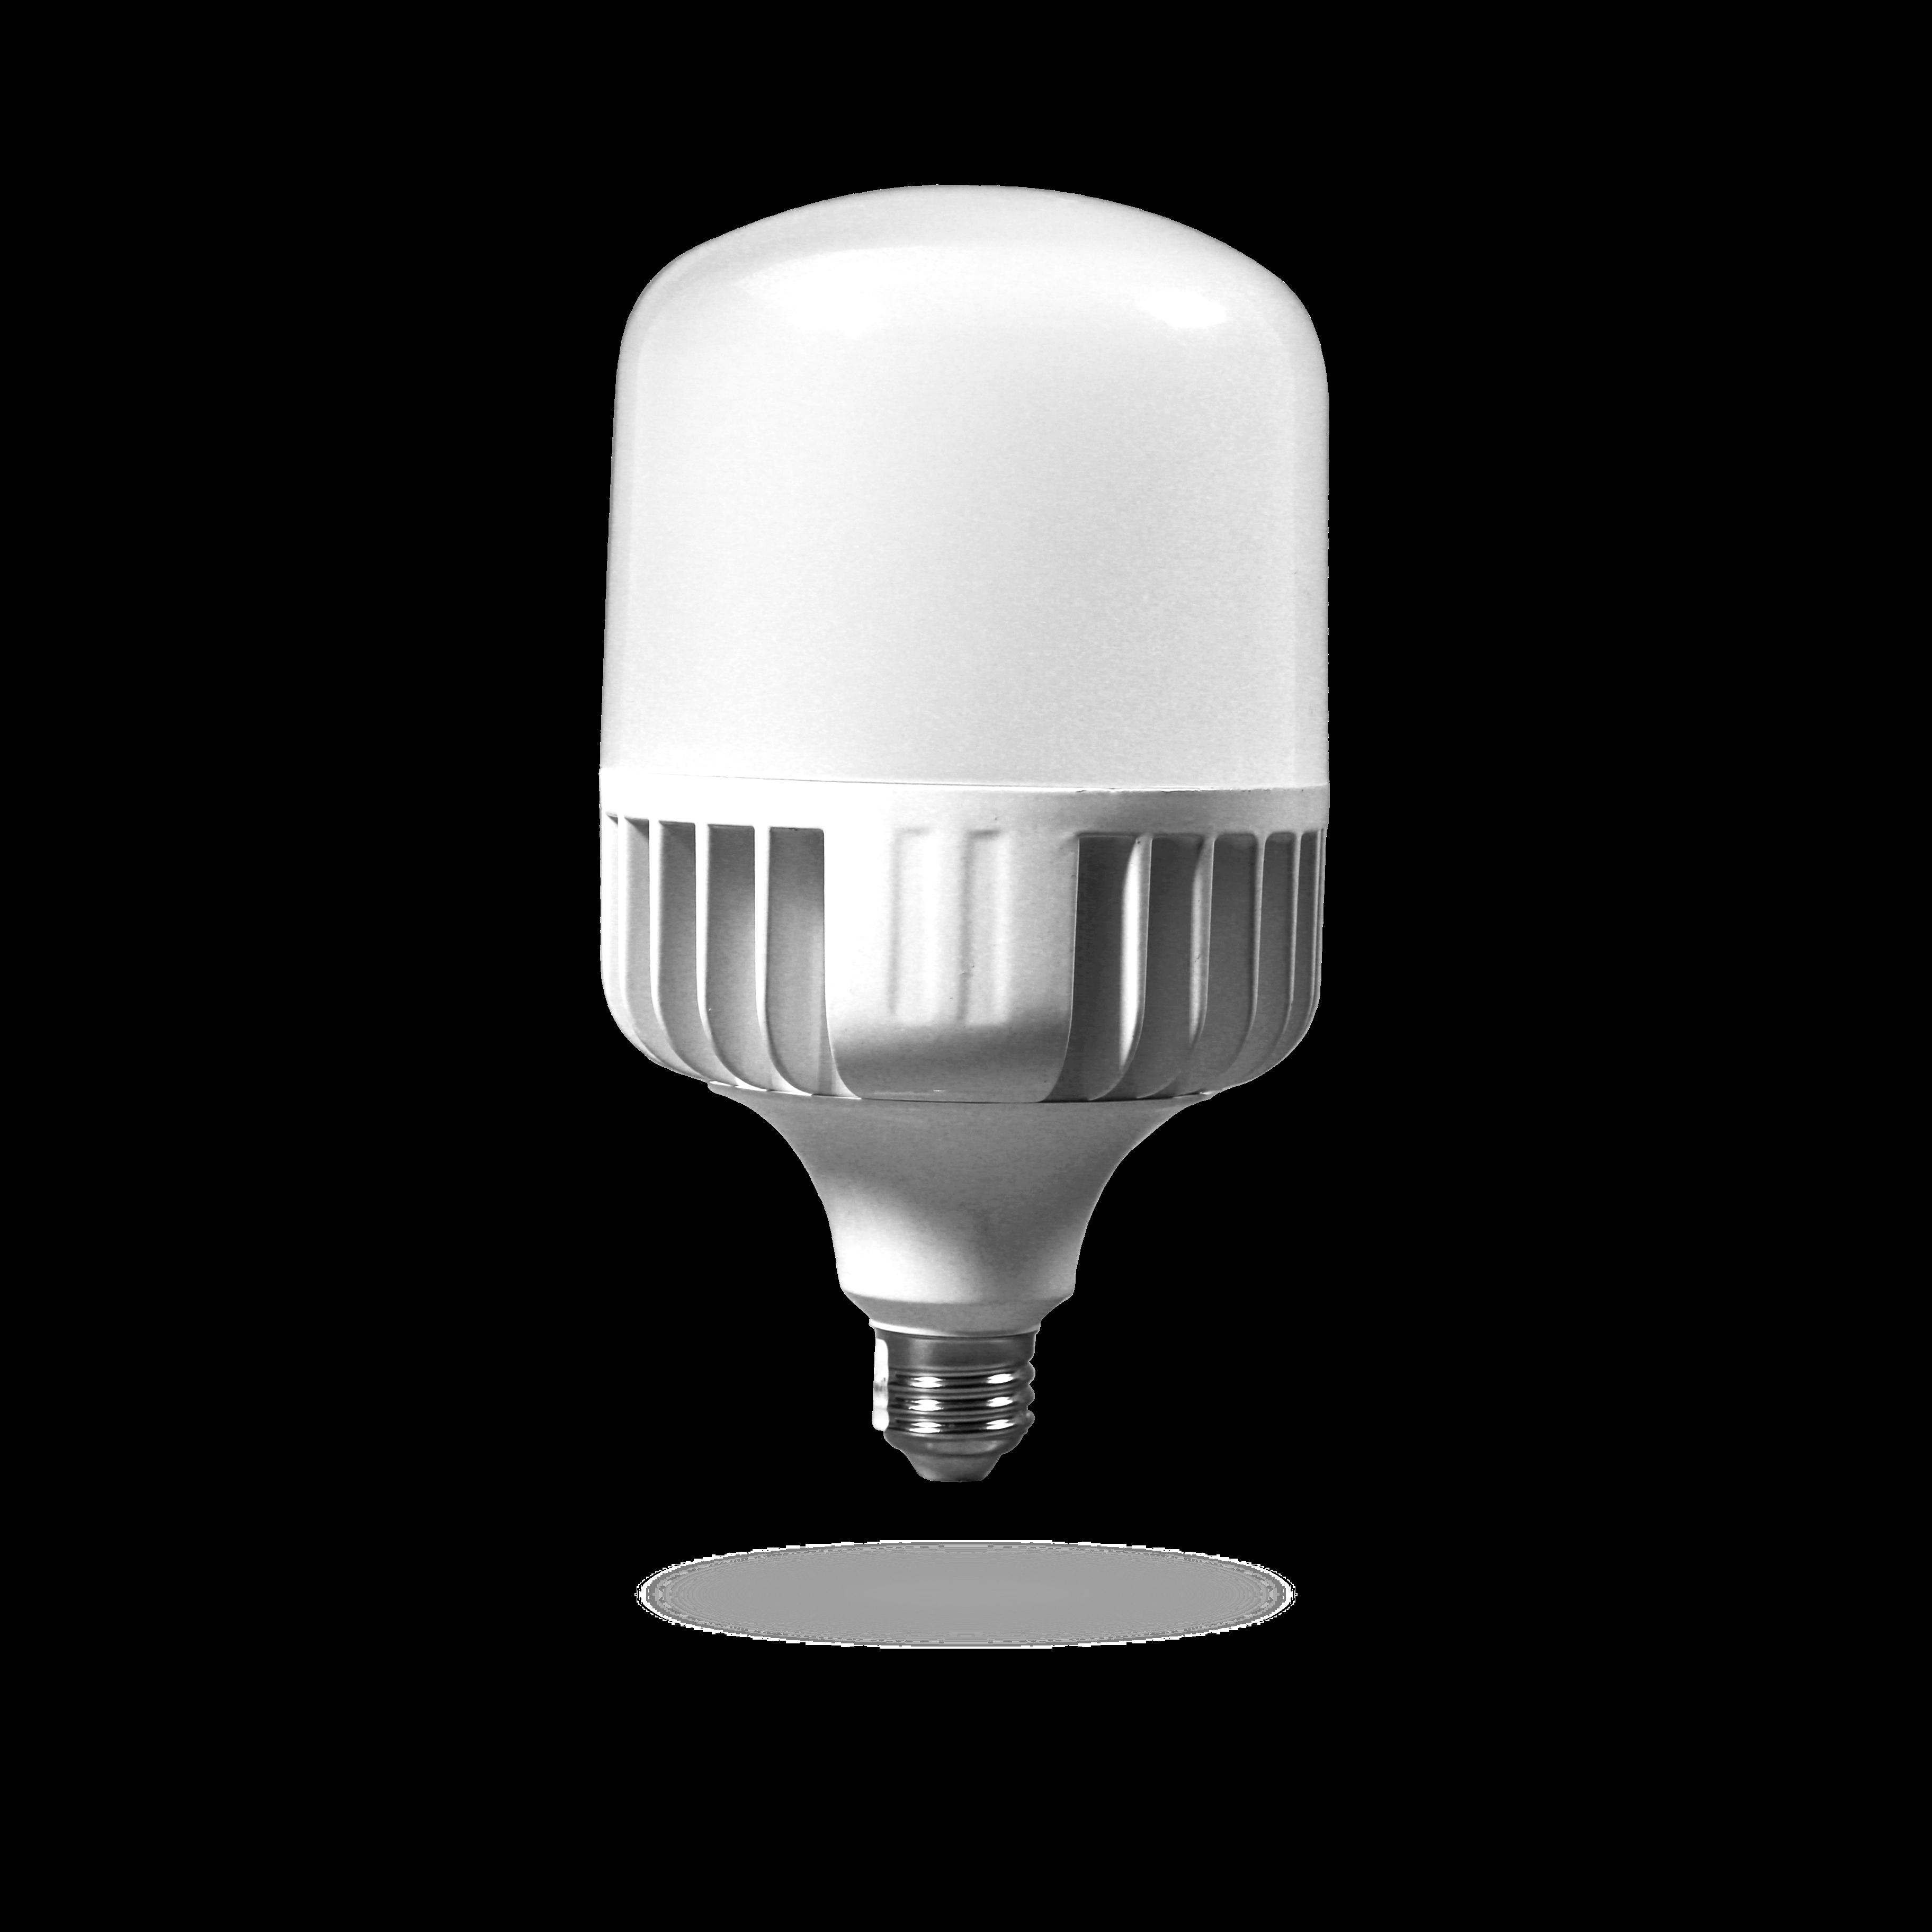 15W/20W/30W/40W E27 Energy Saving High Power LED Bulb Light